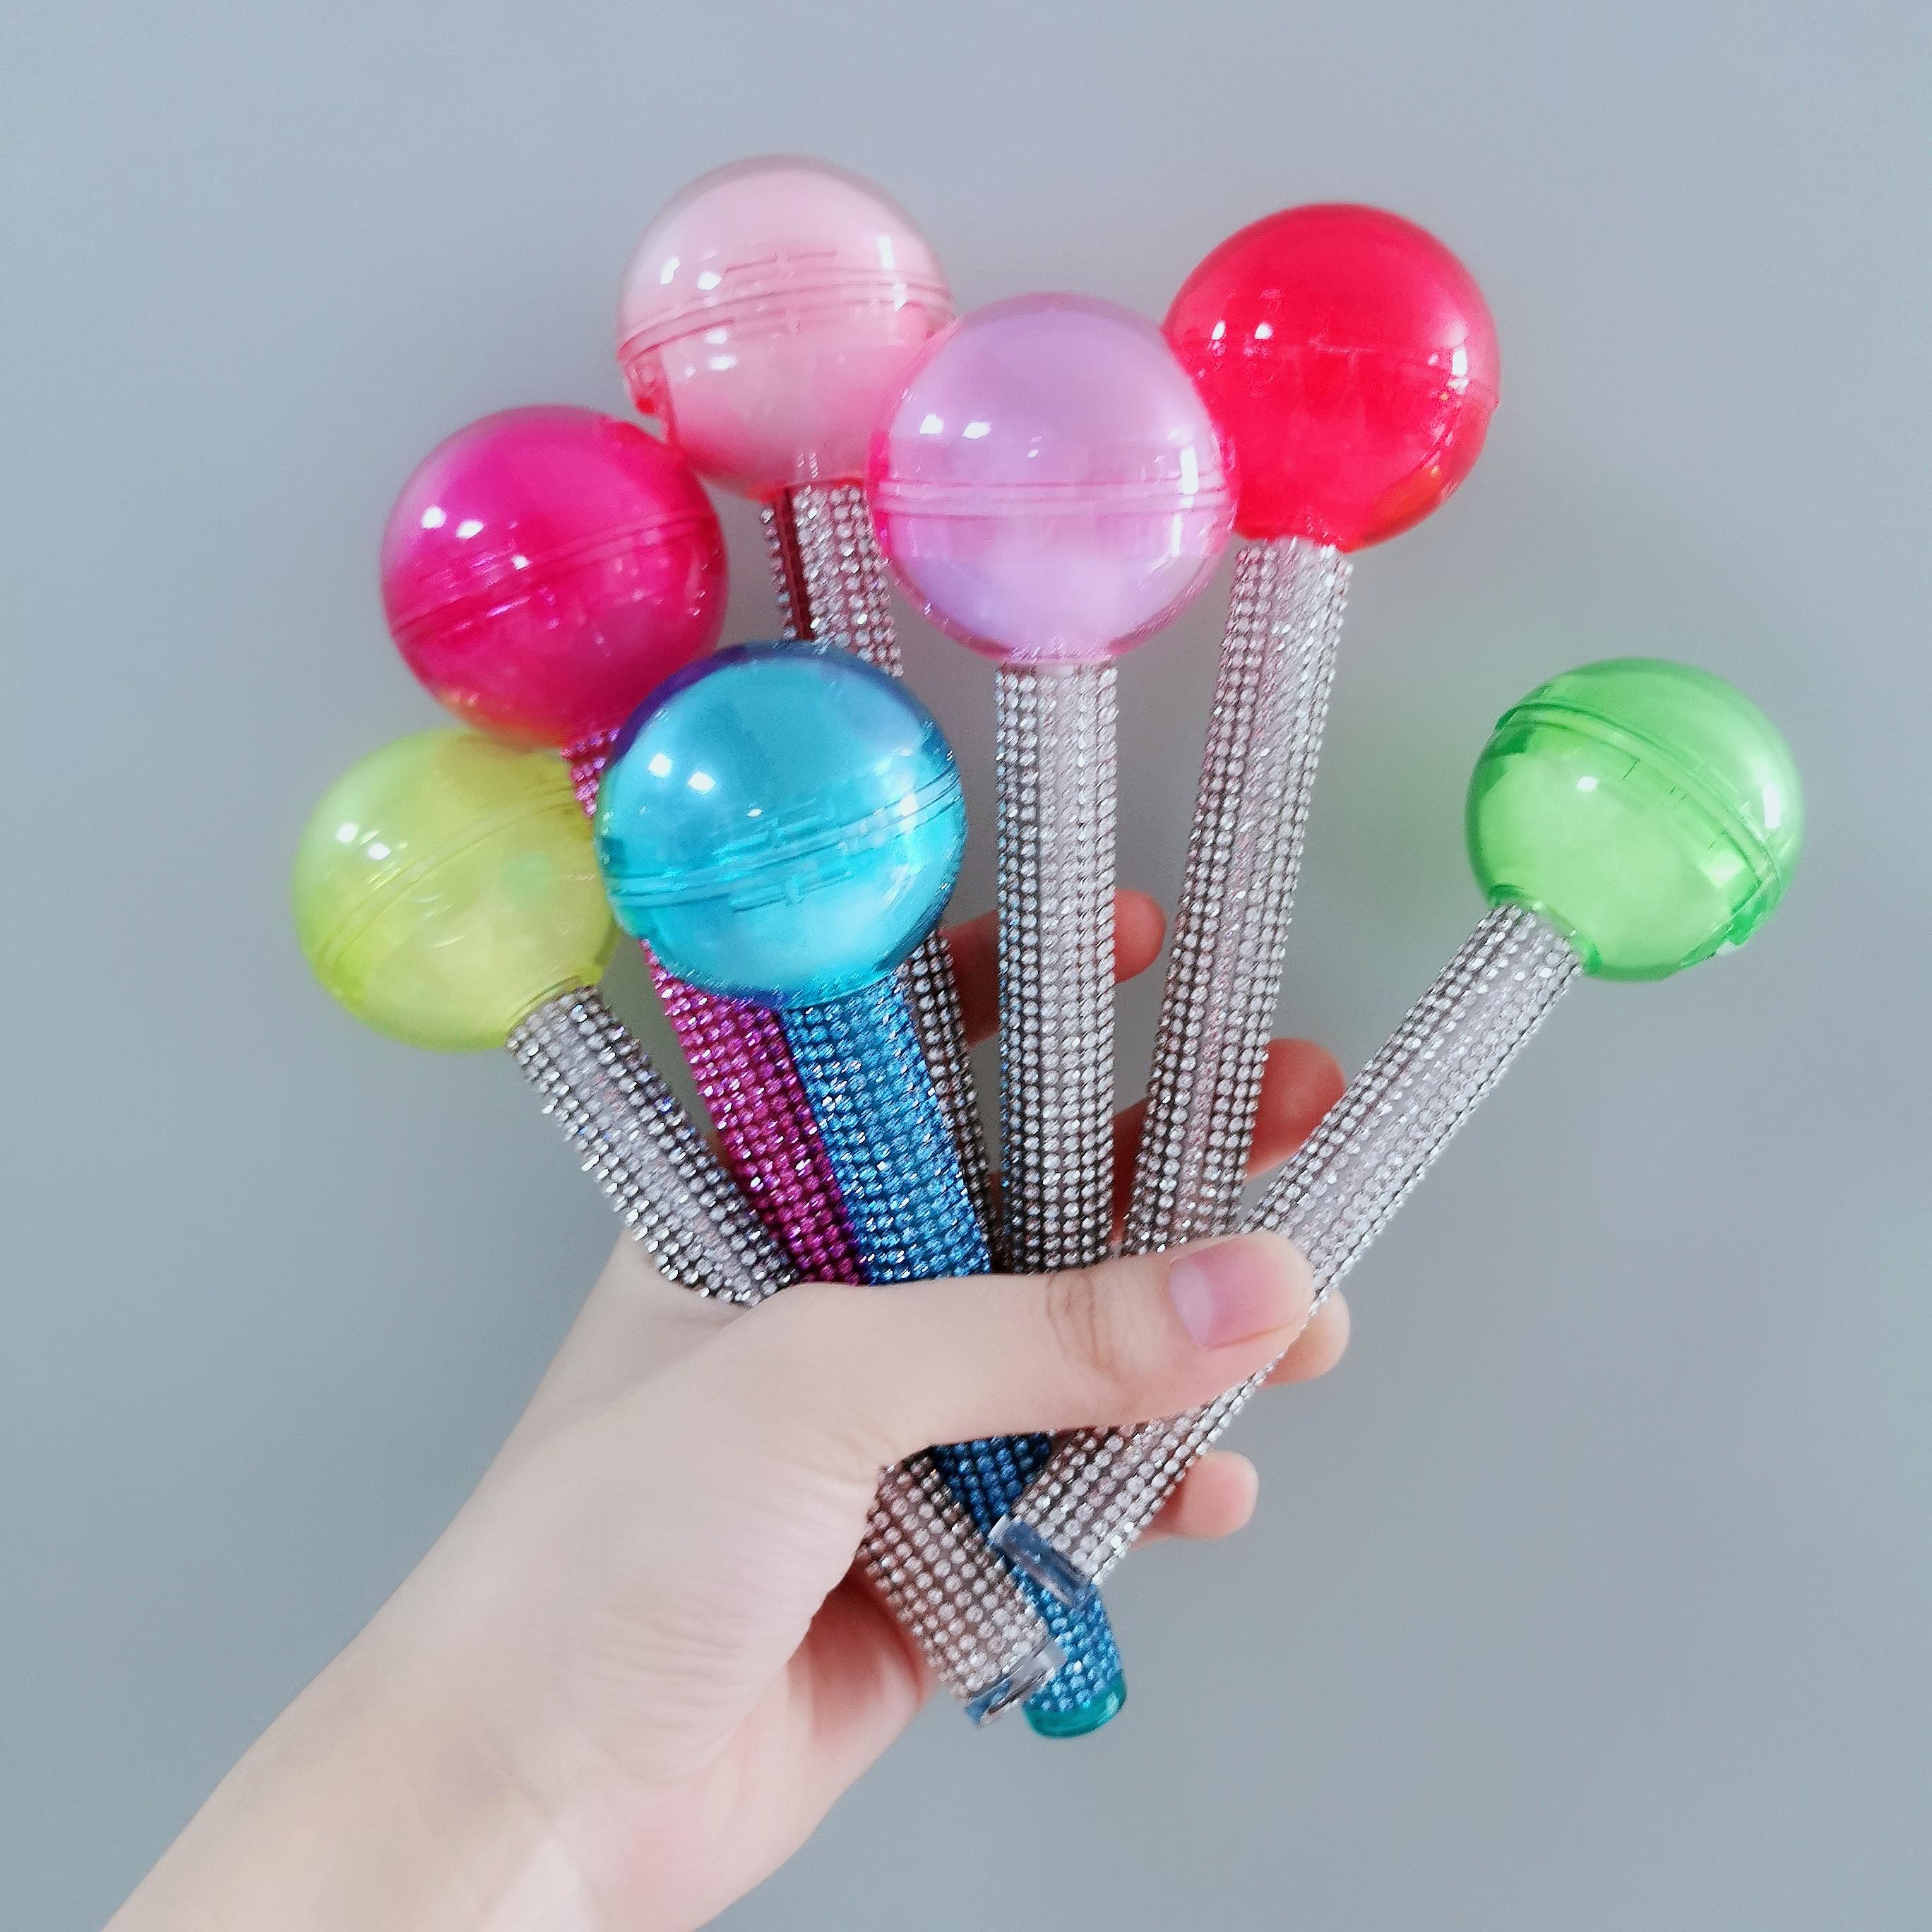 Hot-selling custom fashion jewelry luxury lipstick magical color lollipop lip gloss plastic tube